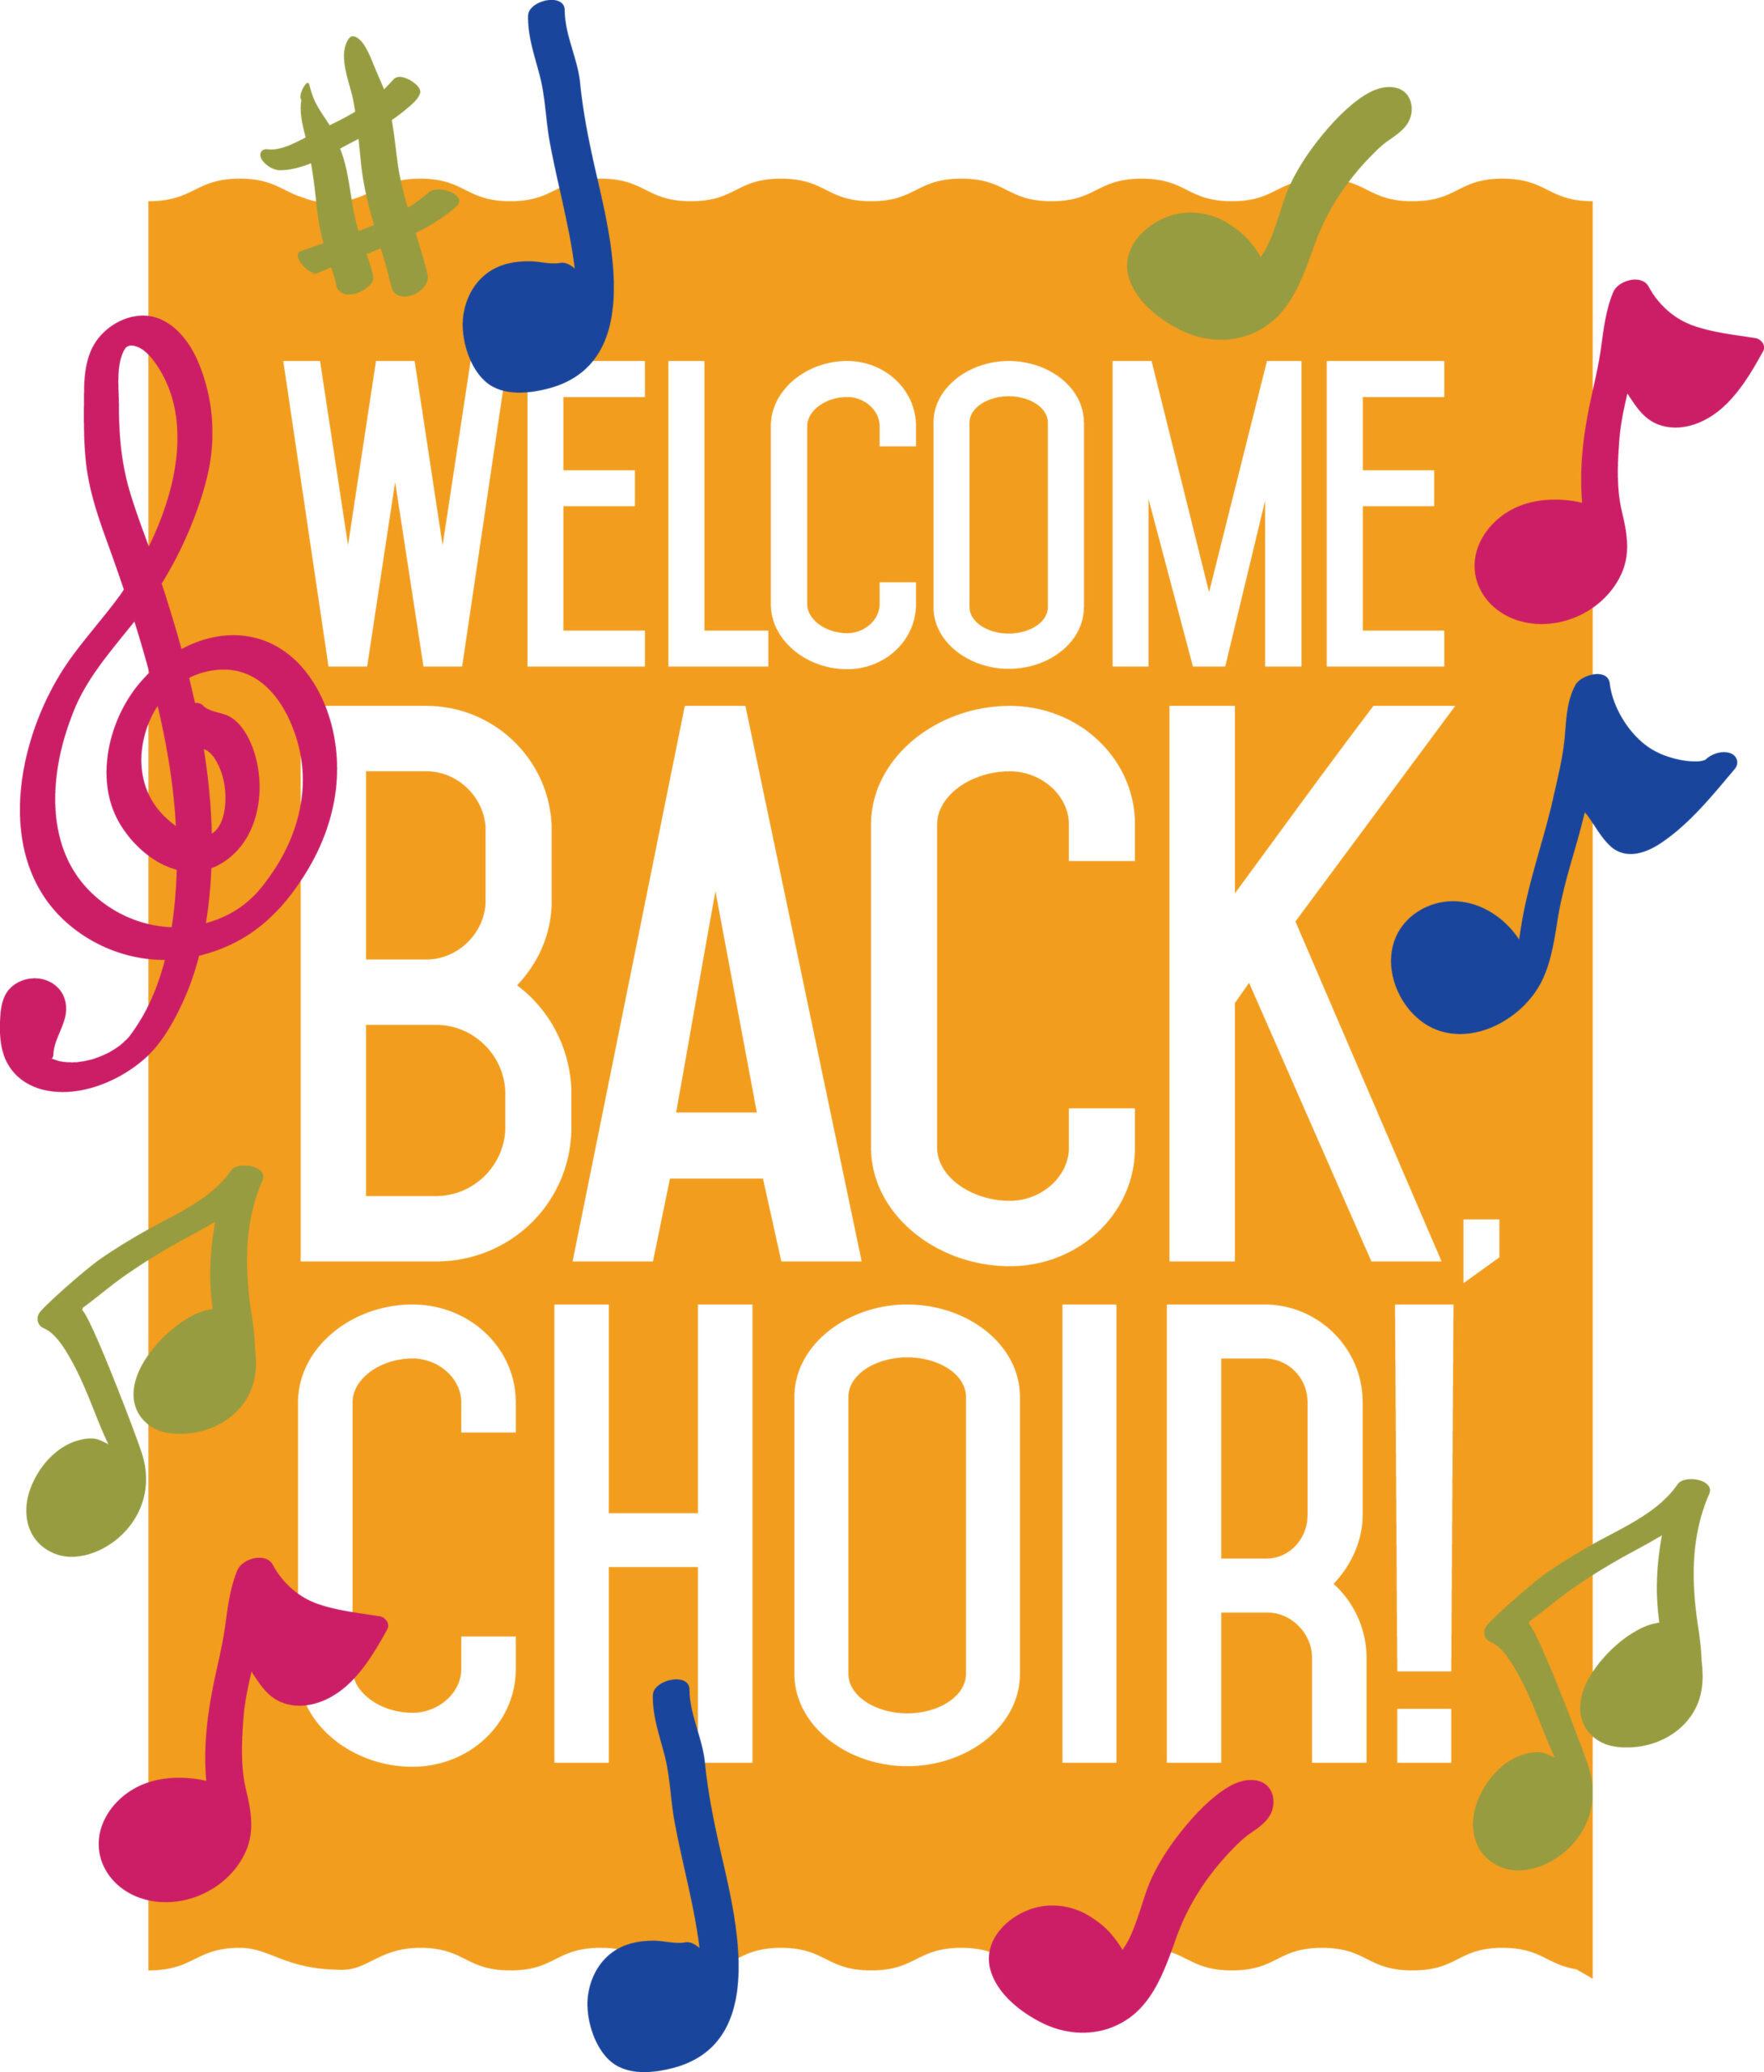 Welcome back choir